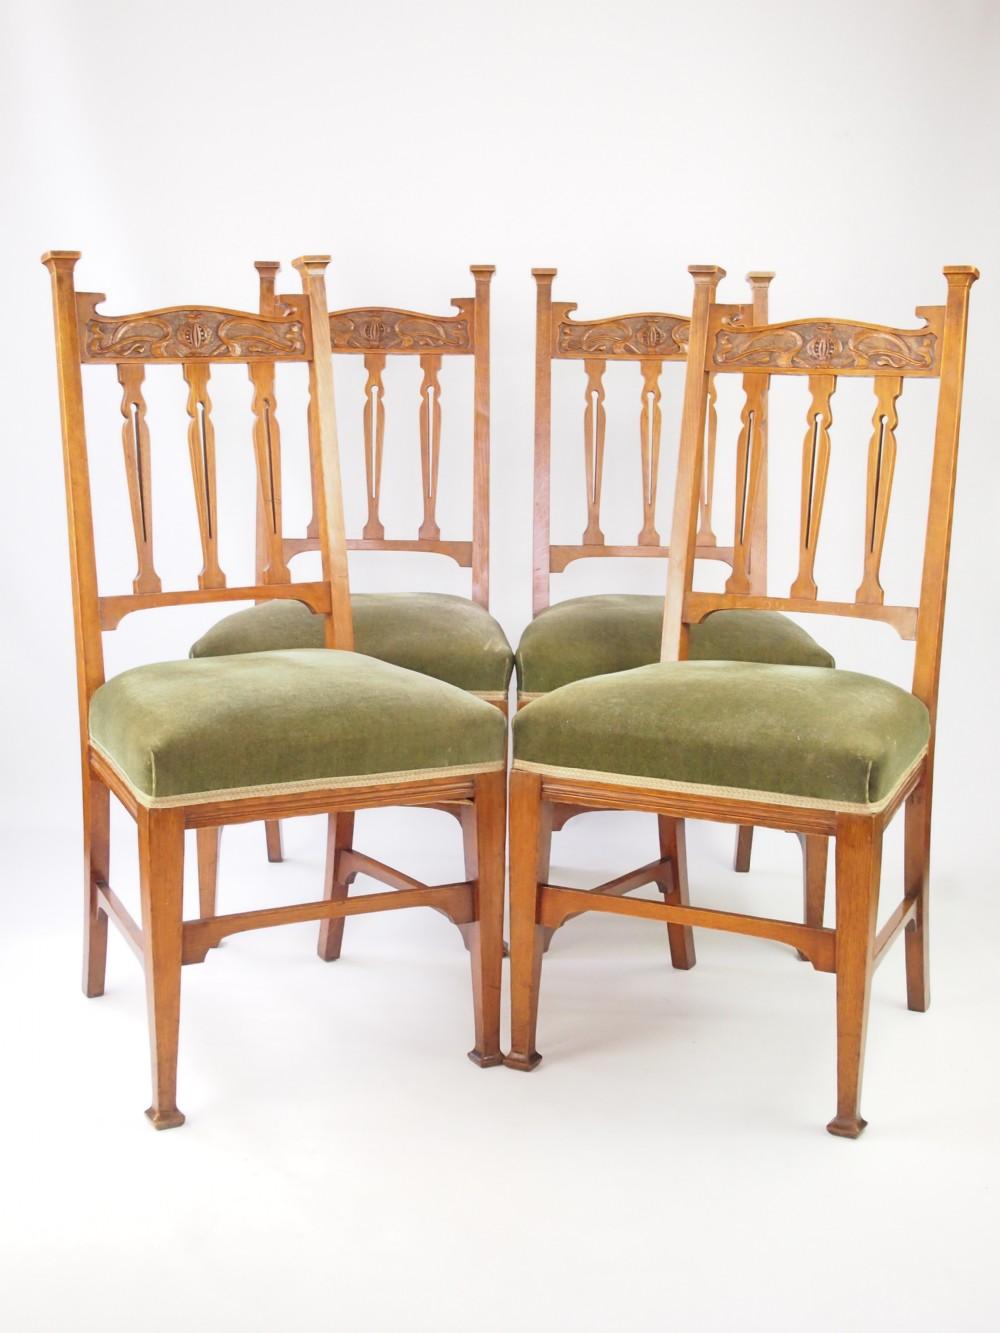 Antique Set 4 Golden Oak Dining Chairs 285389